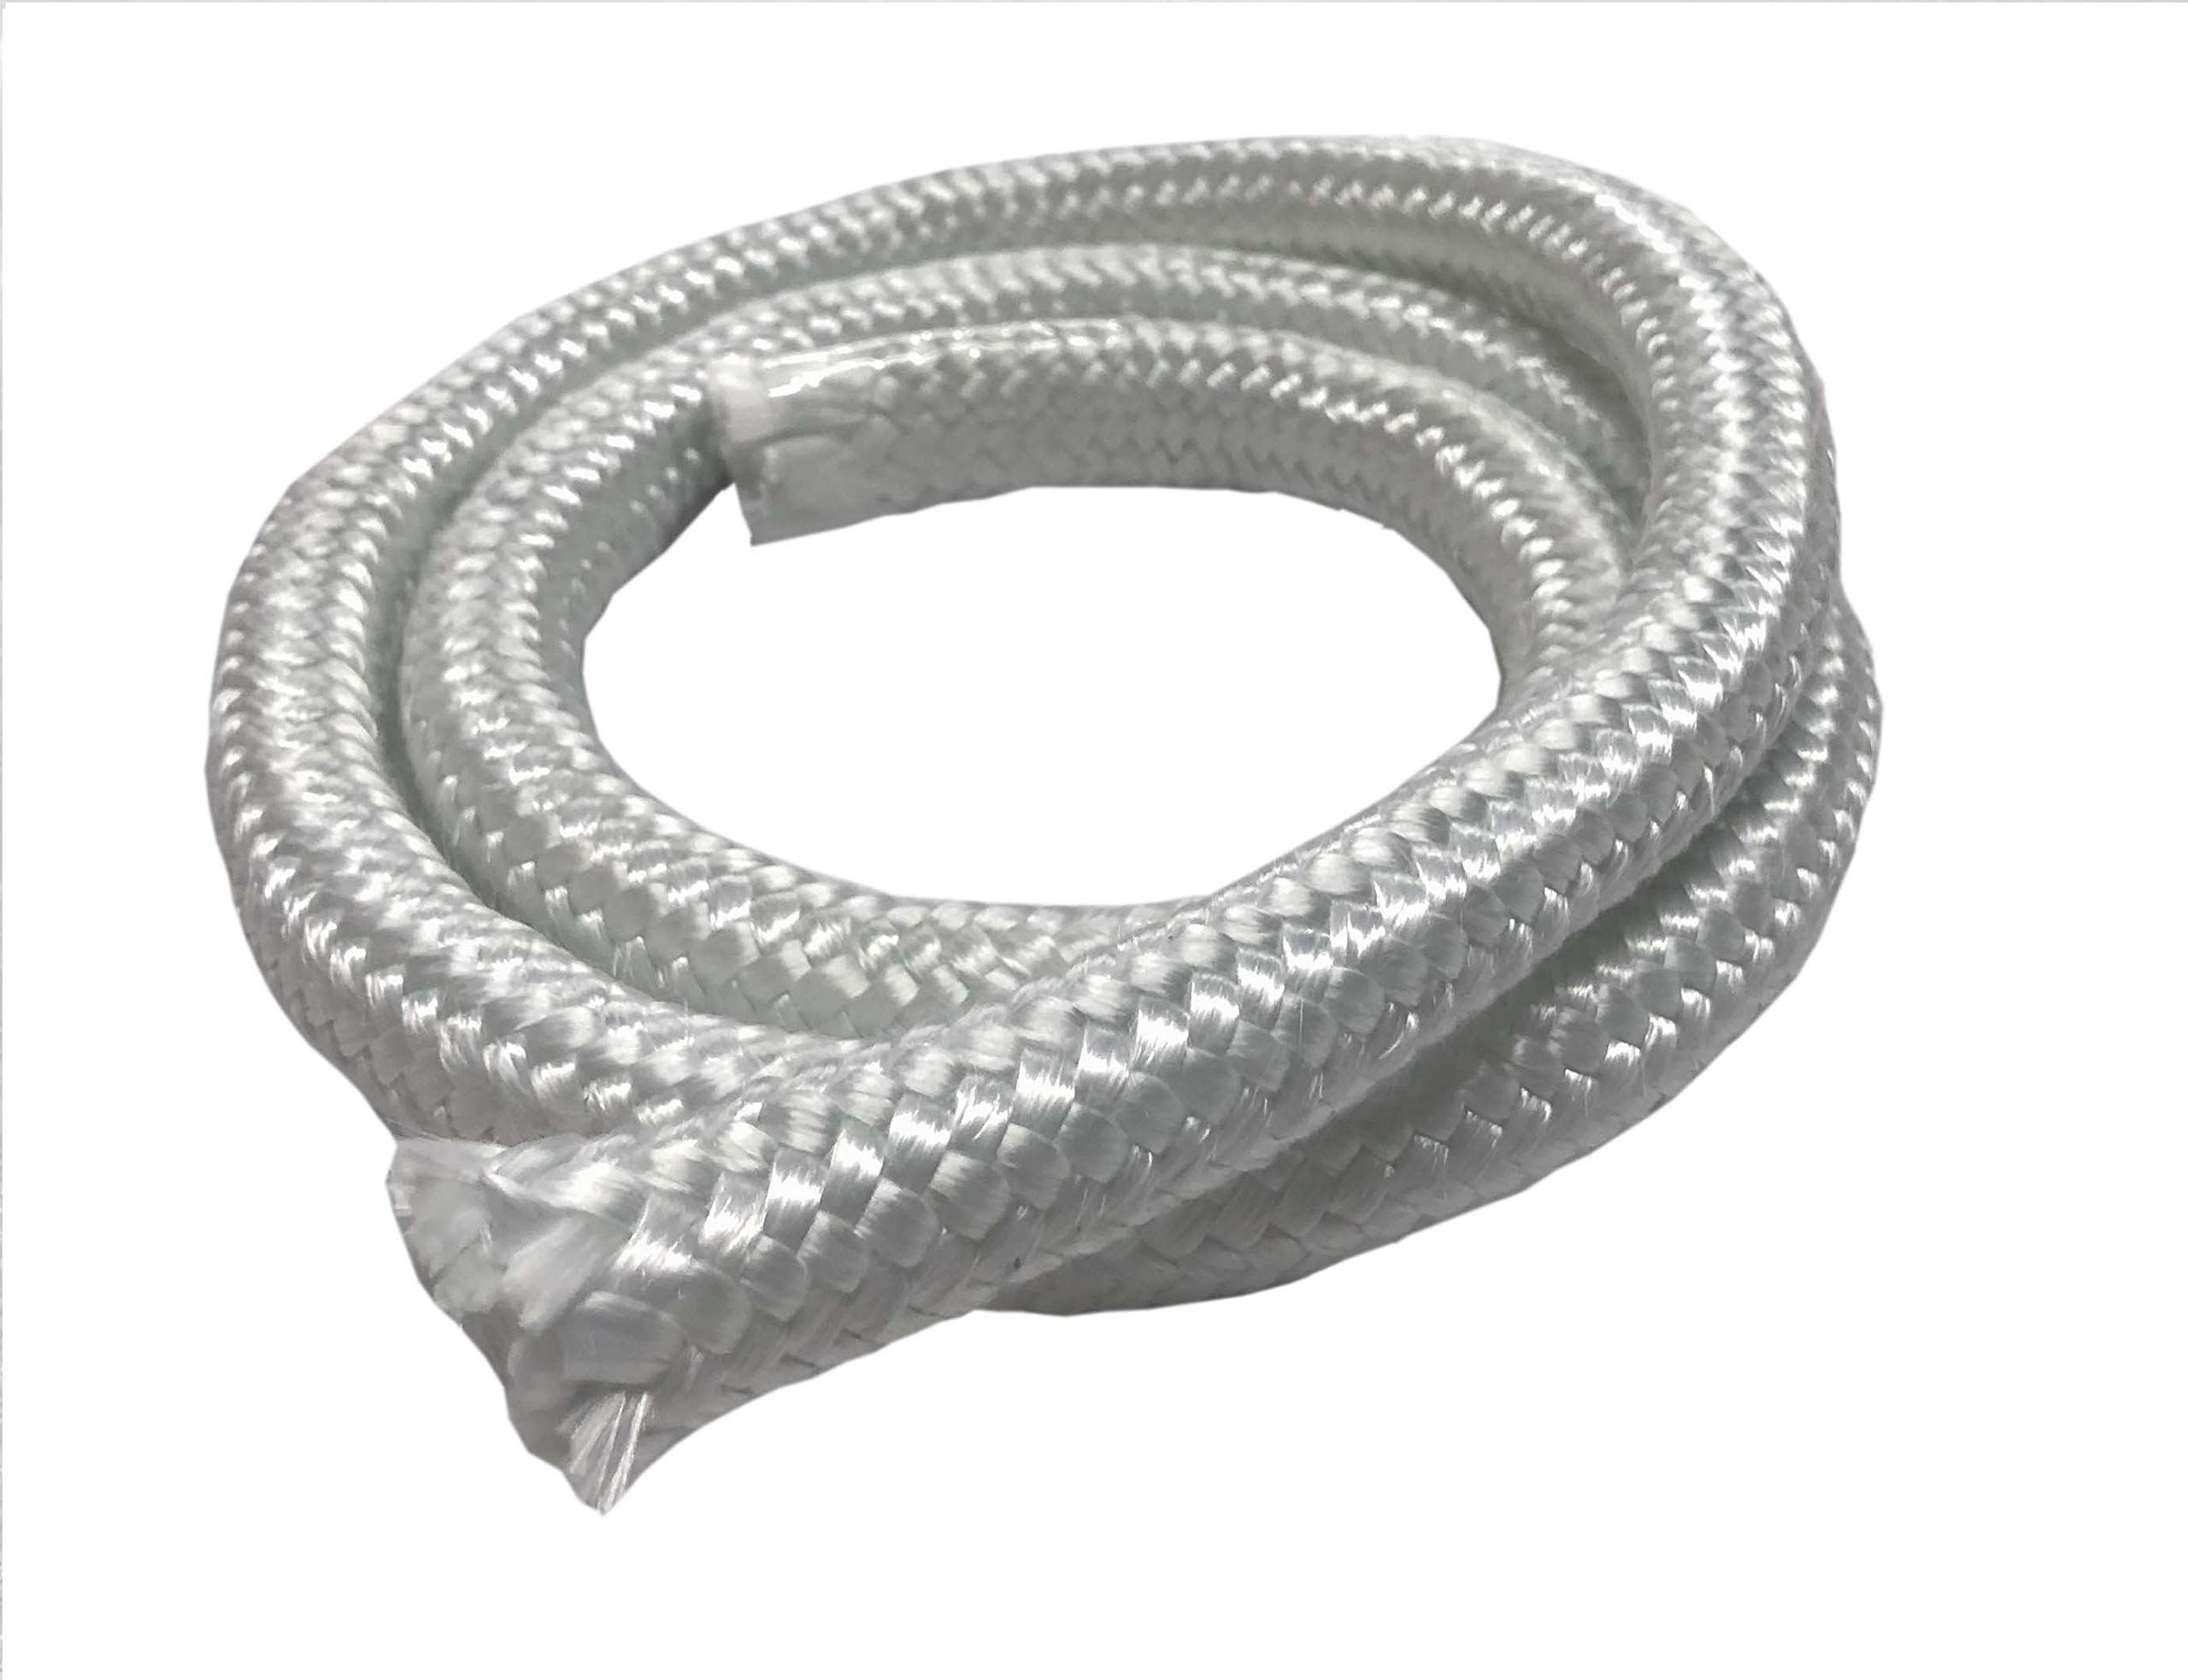 MinGlas Rope Seal - Fiberglass High Density Rope Gasket 3/4'' x 25 feet, Firm Round Braided, Stove Boiler Furnace Oven Kiln Door Seal Gasket